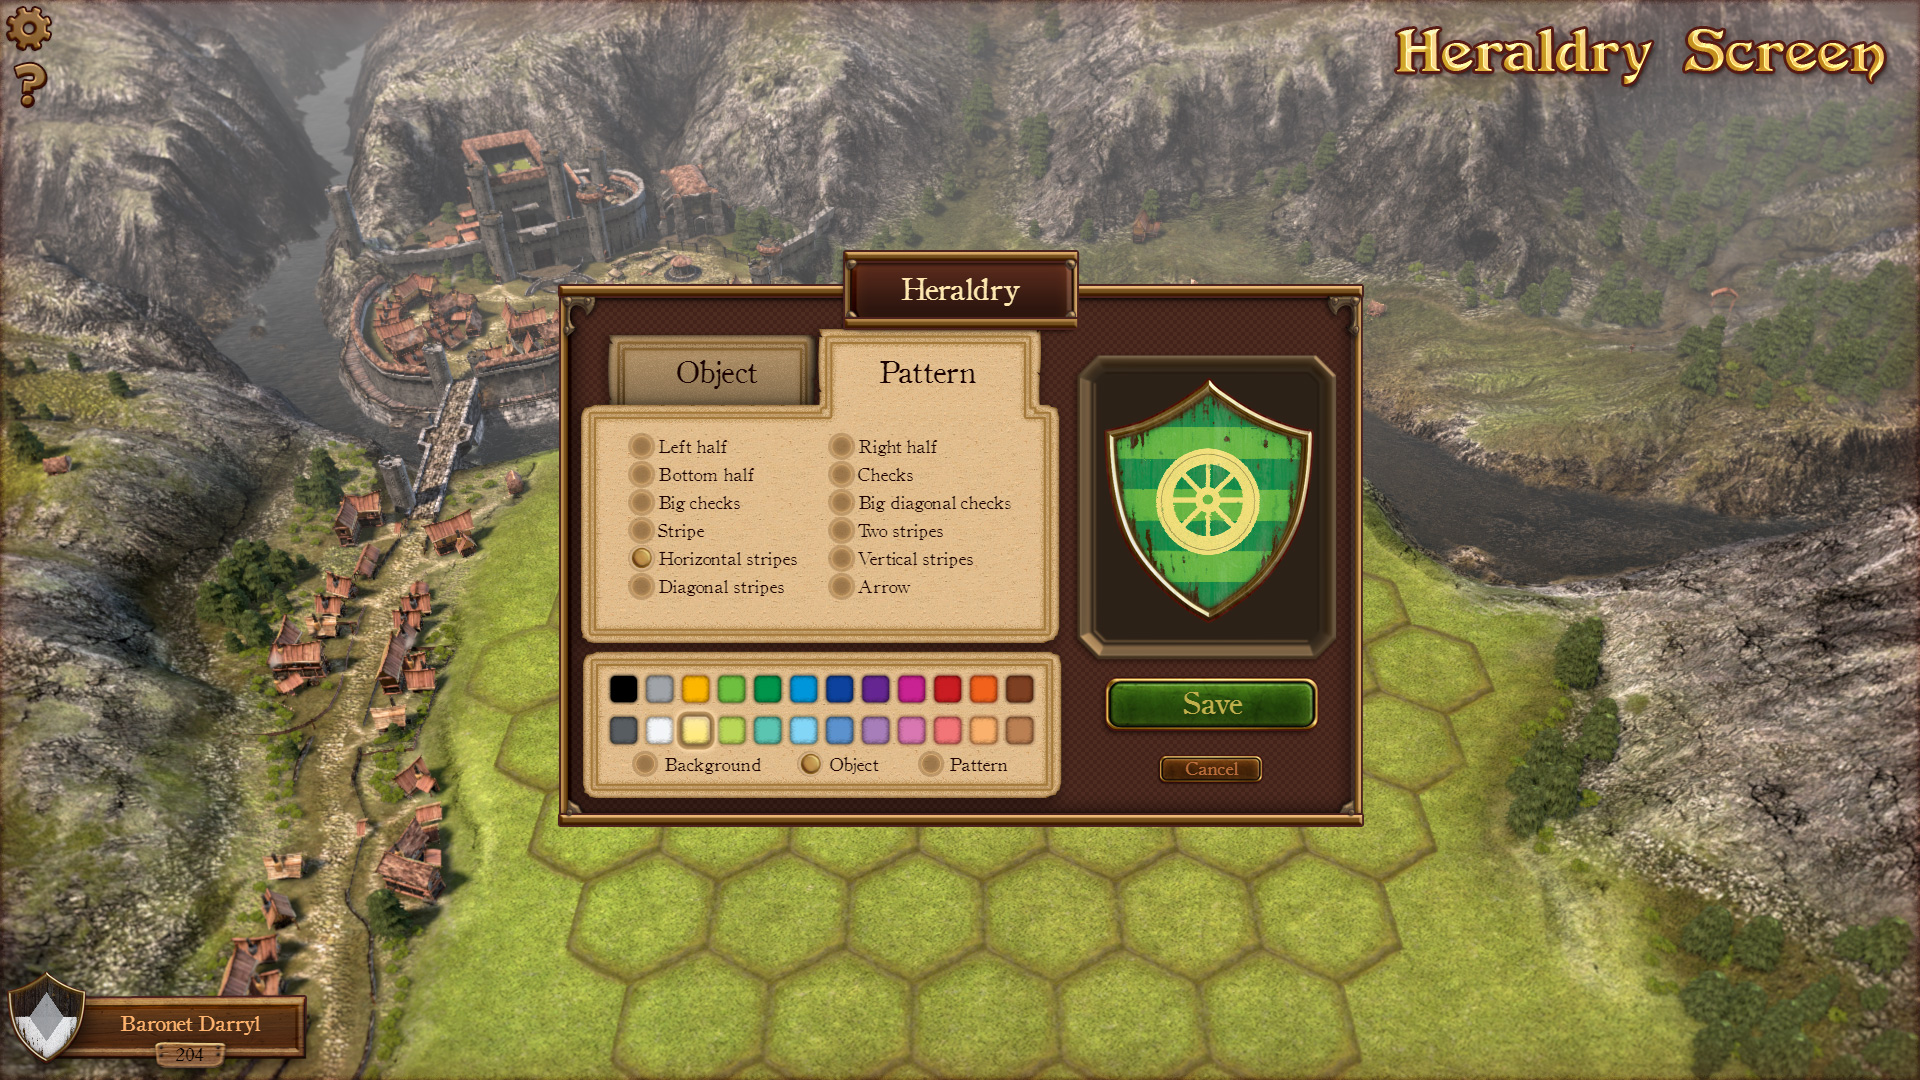 6 Heraldry Screen